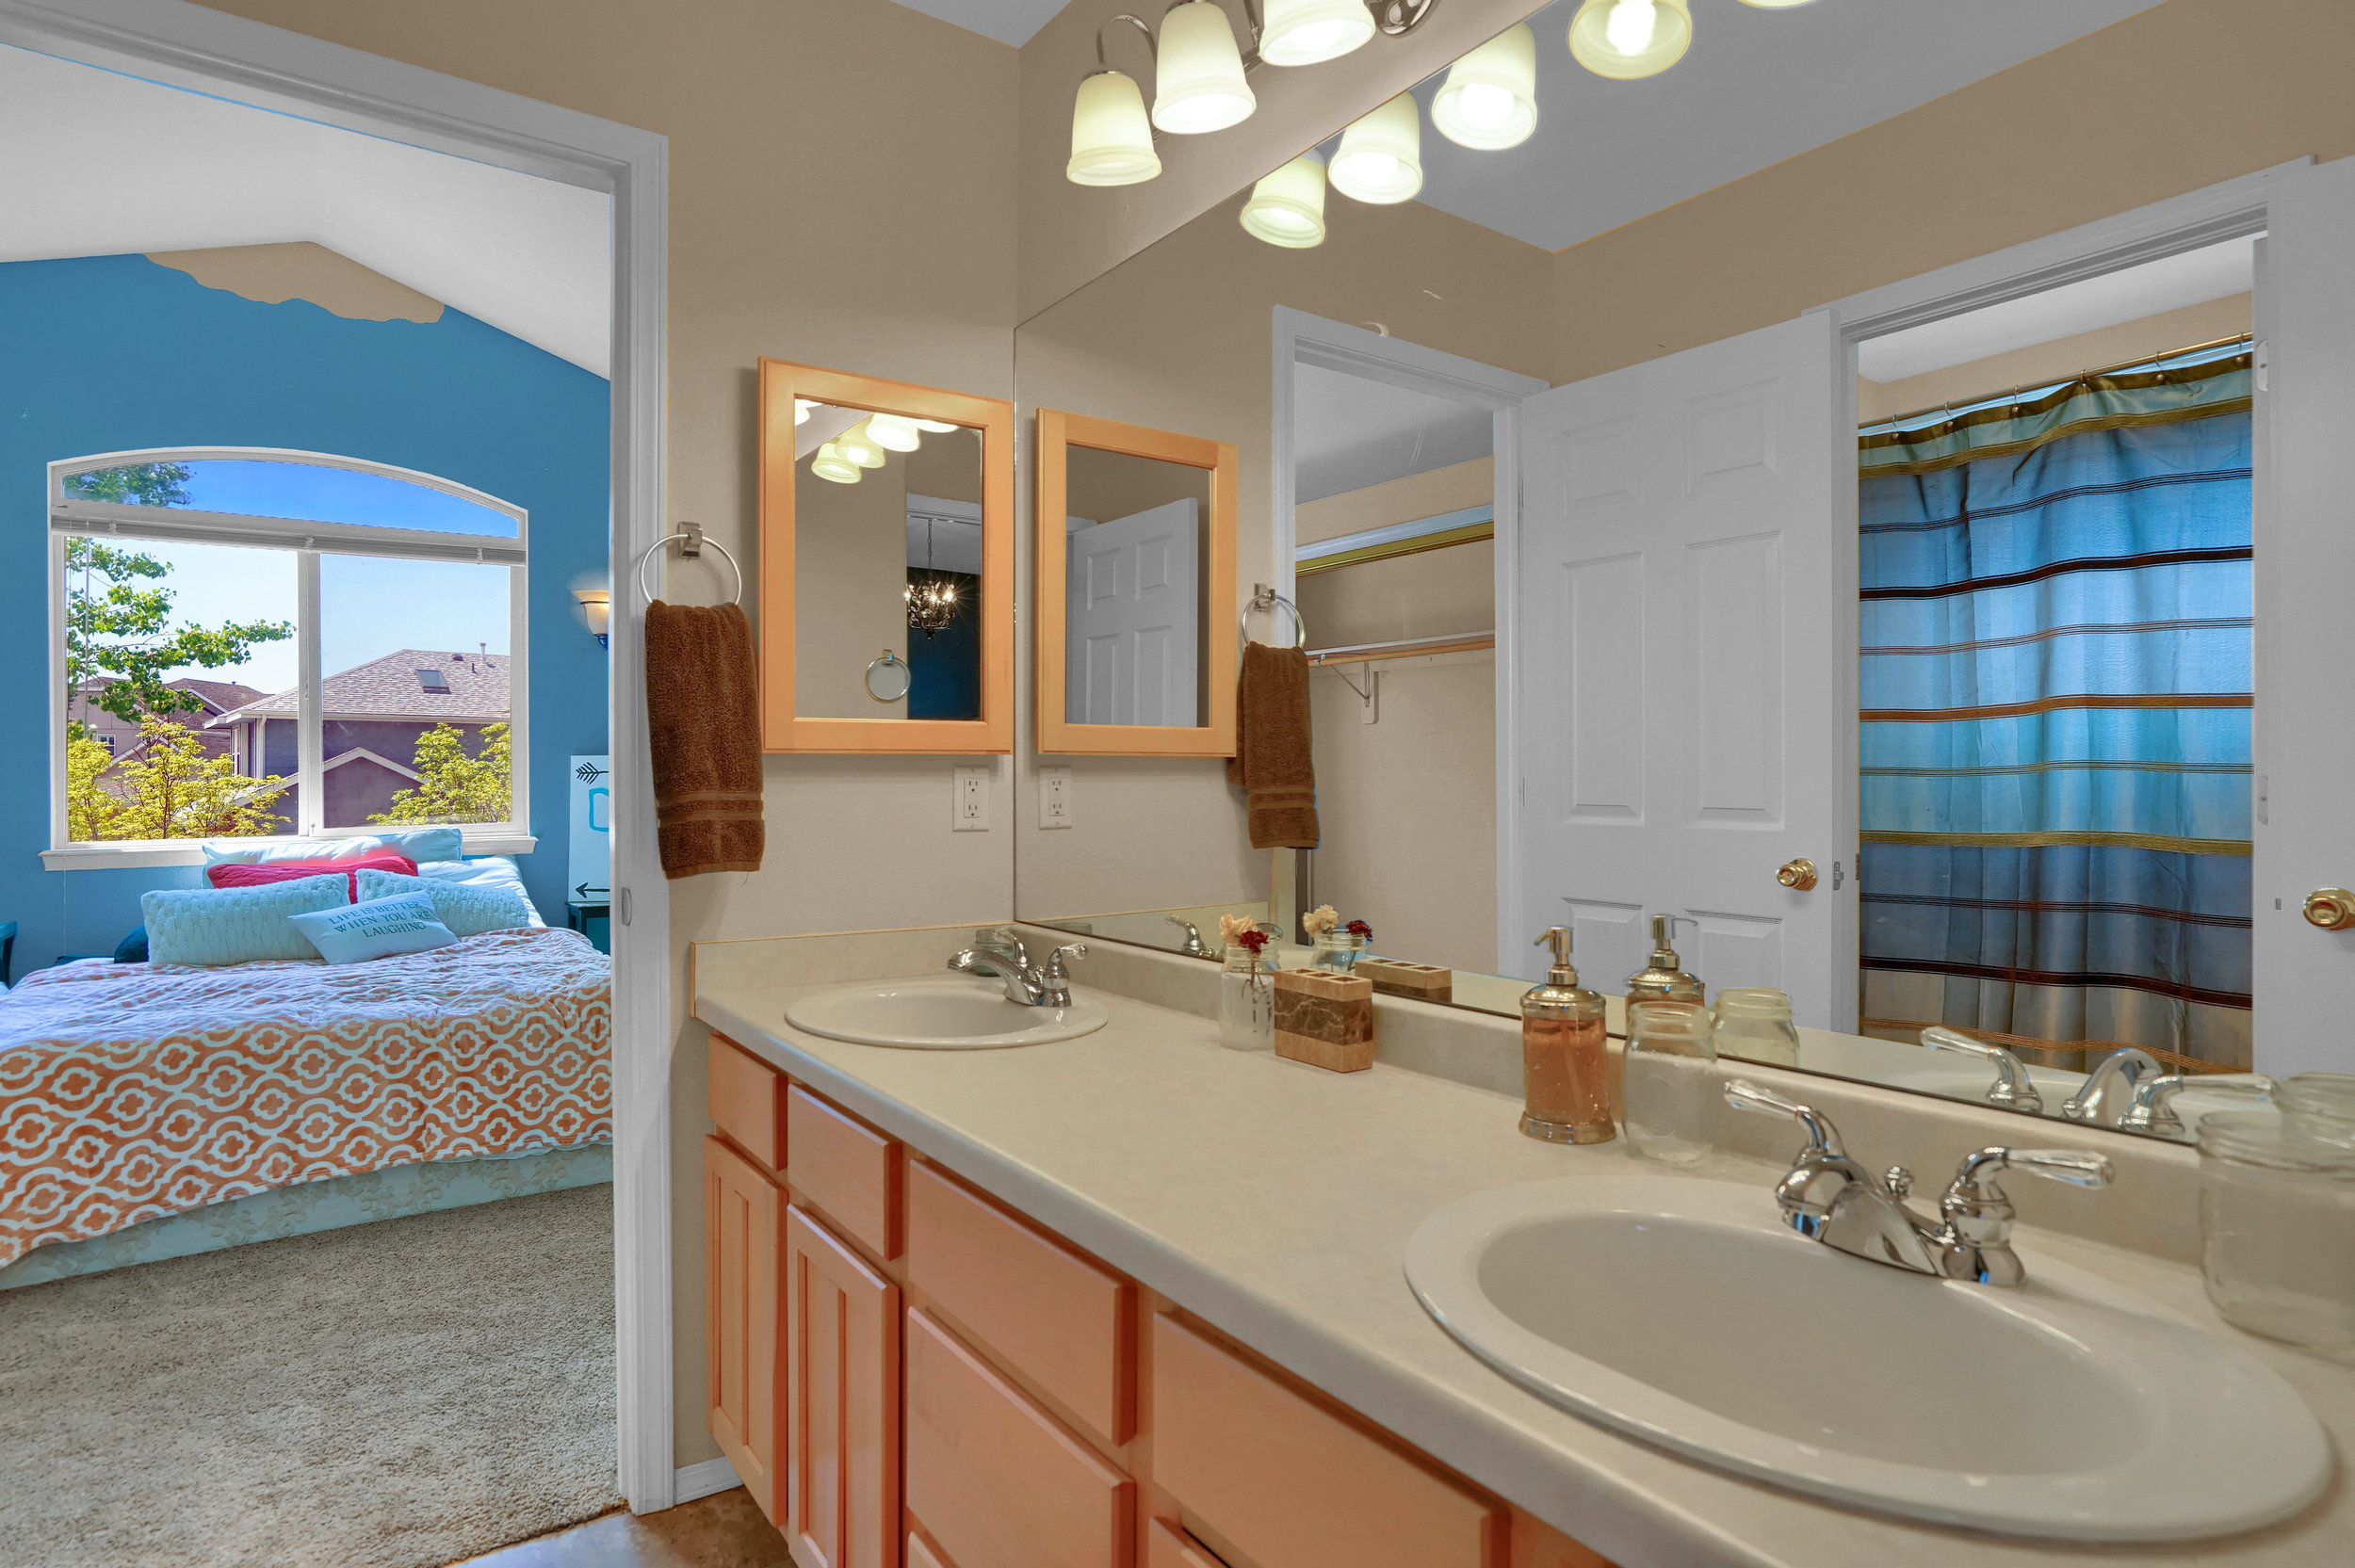 2756 Kittyhawk Road Colorado-print-018-003-Bathroom-3931x2618-300dpi.jpg